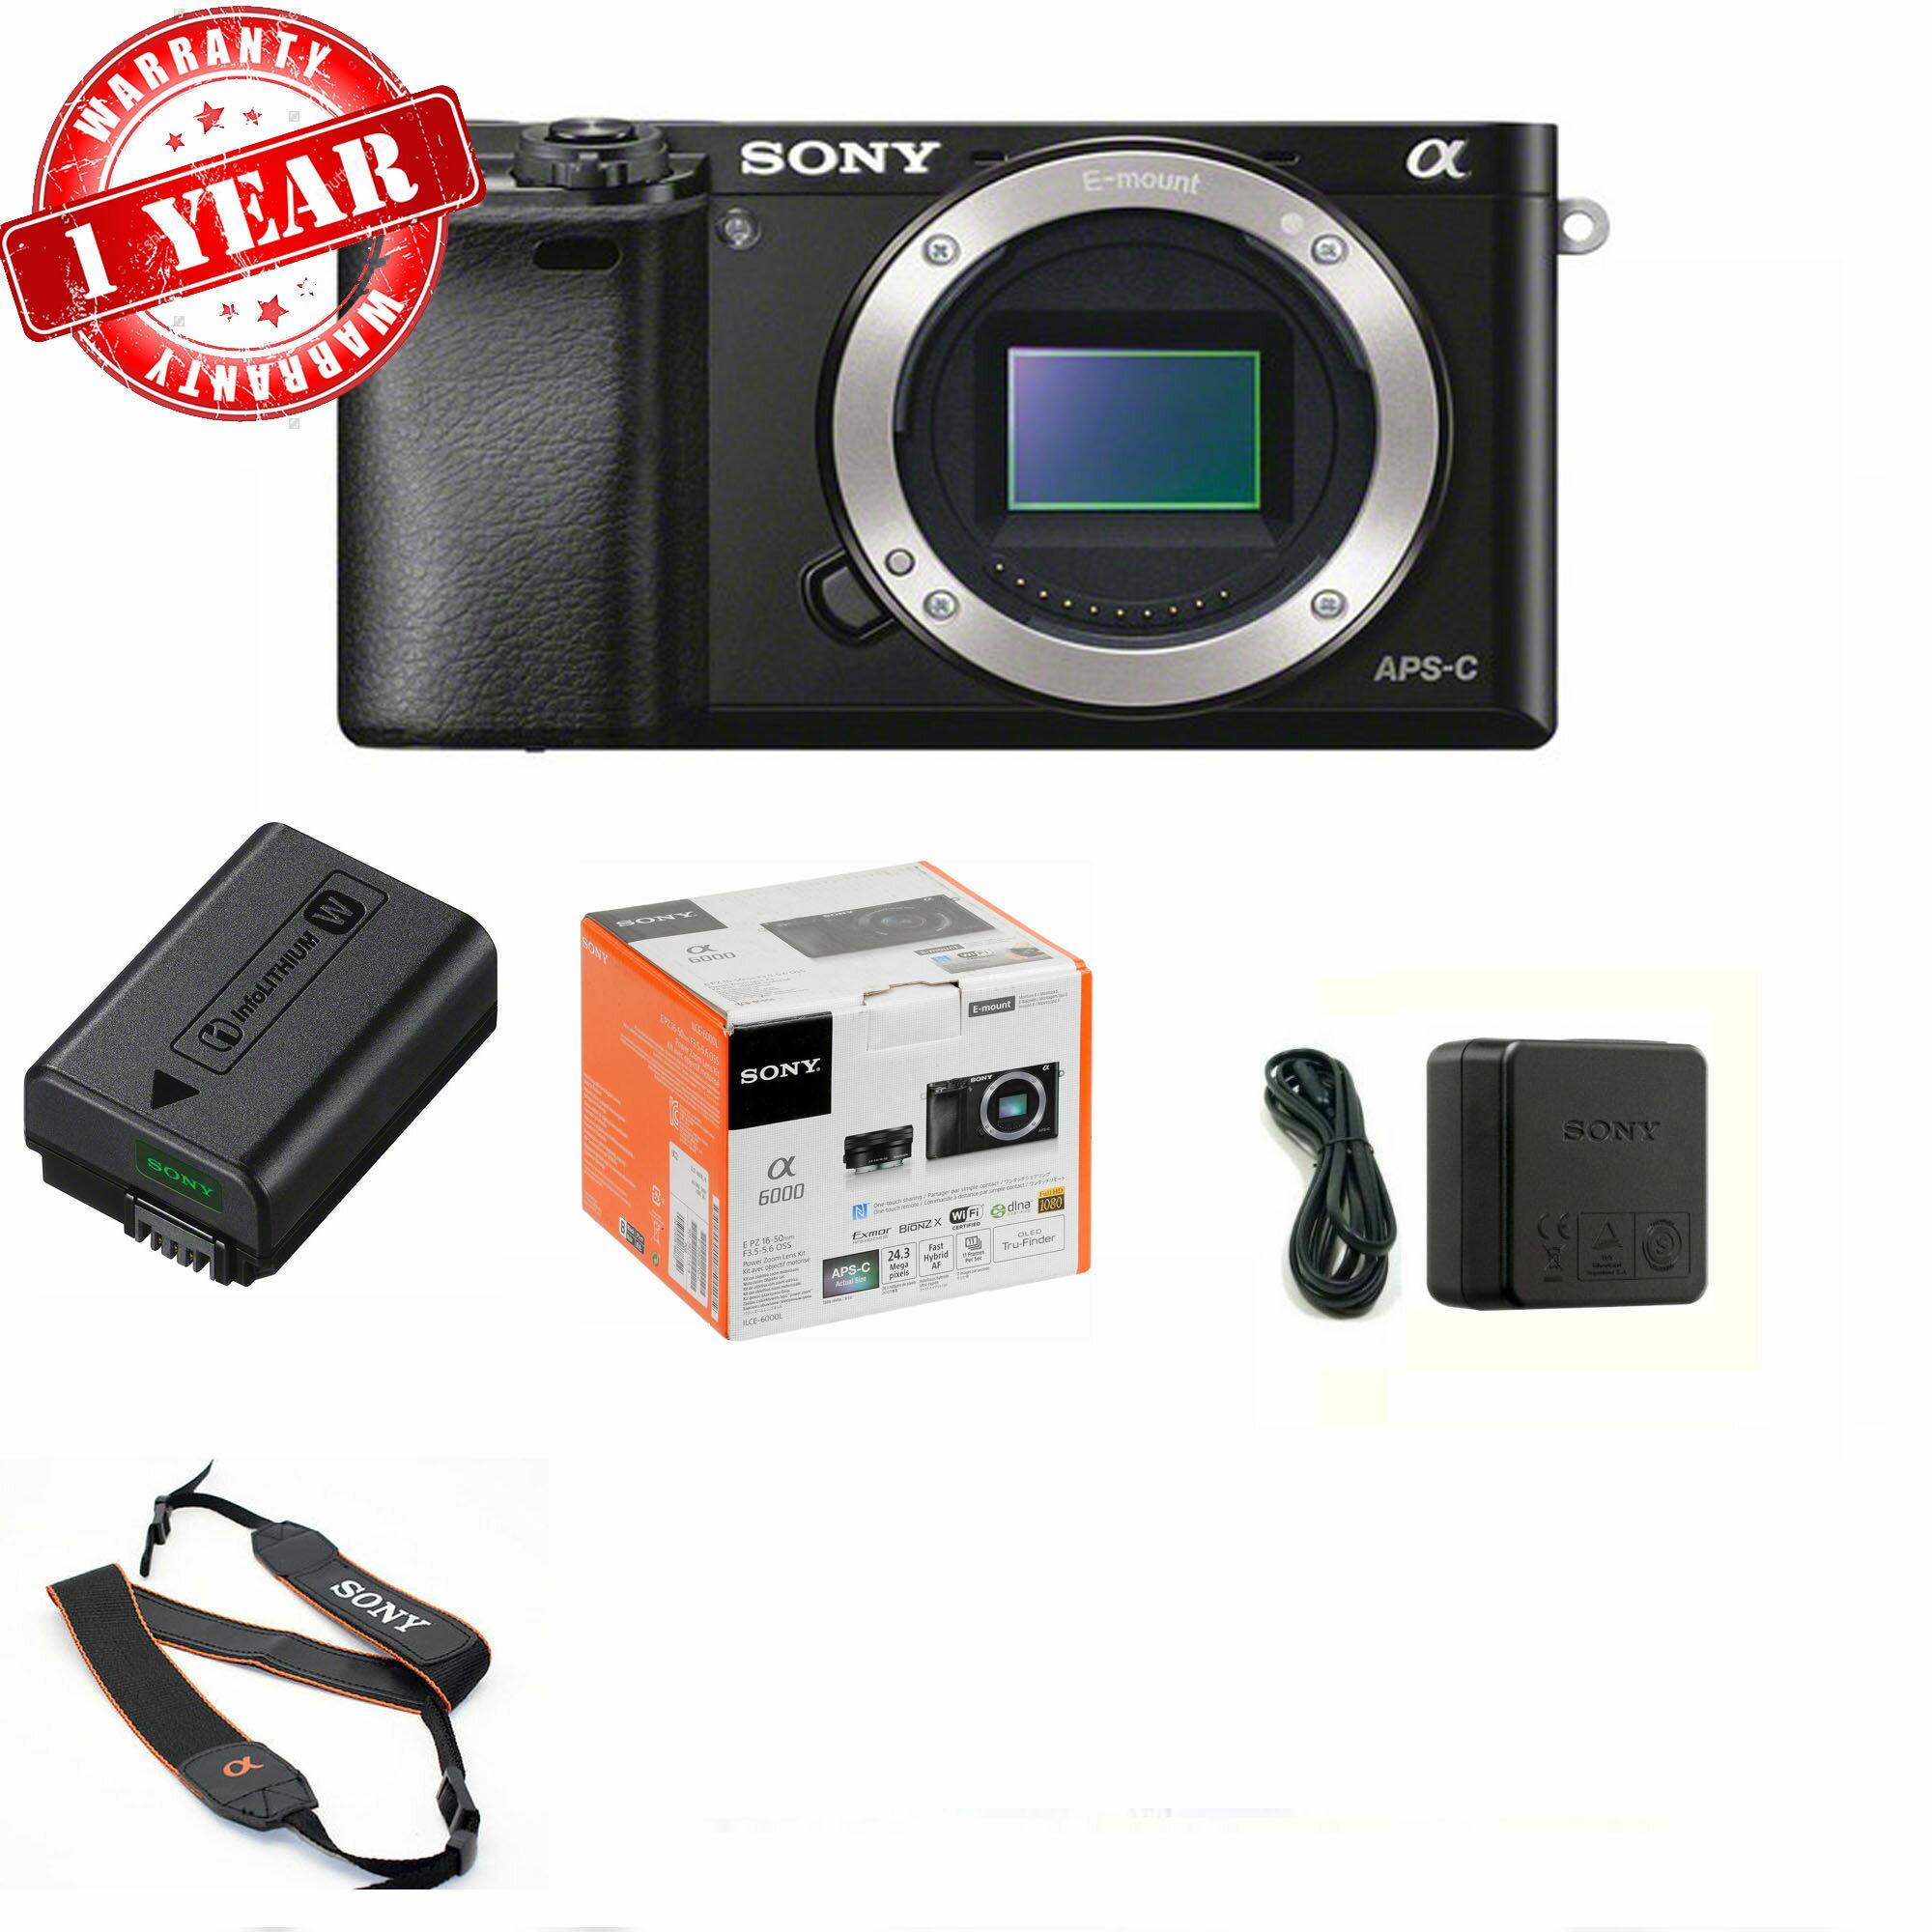 Get It Speedy: Sony alpha a6000 24 3 Megapixel Mirrorless